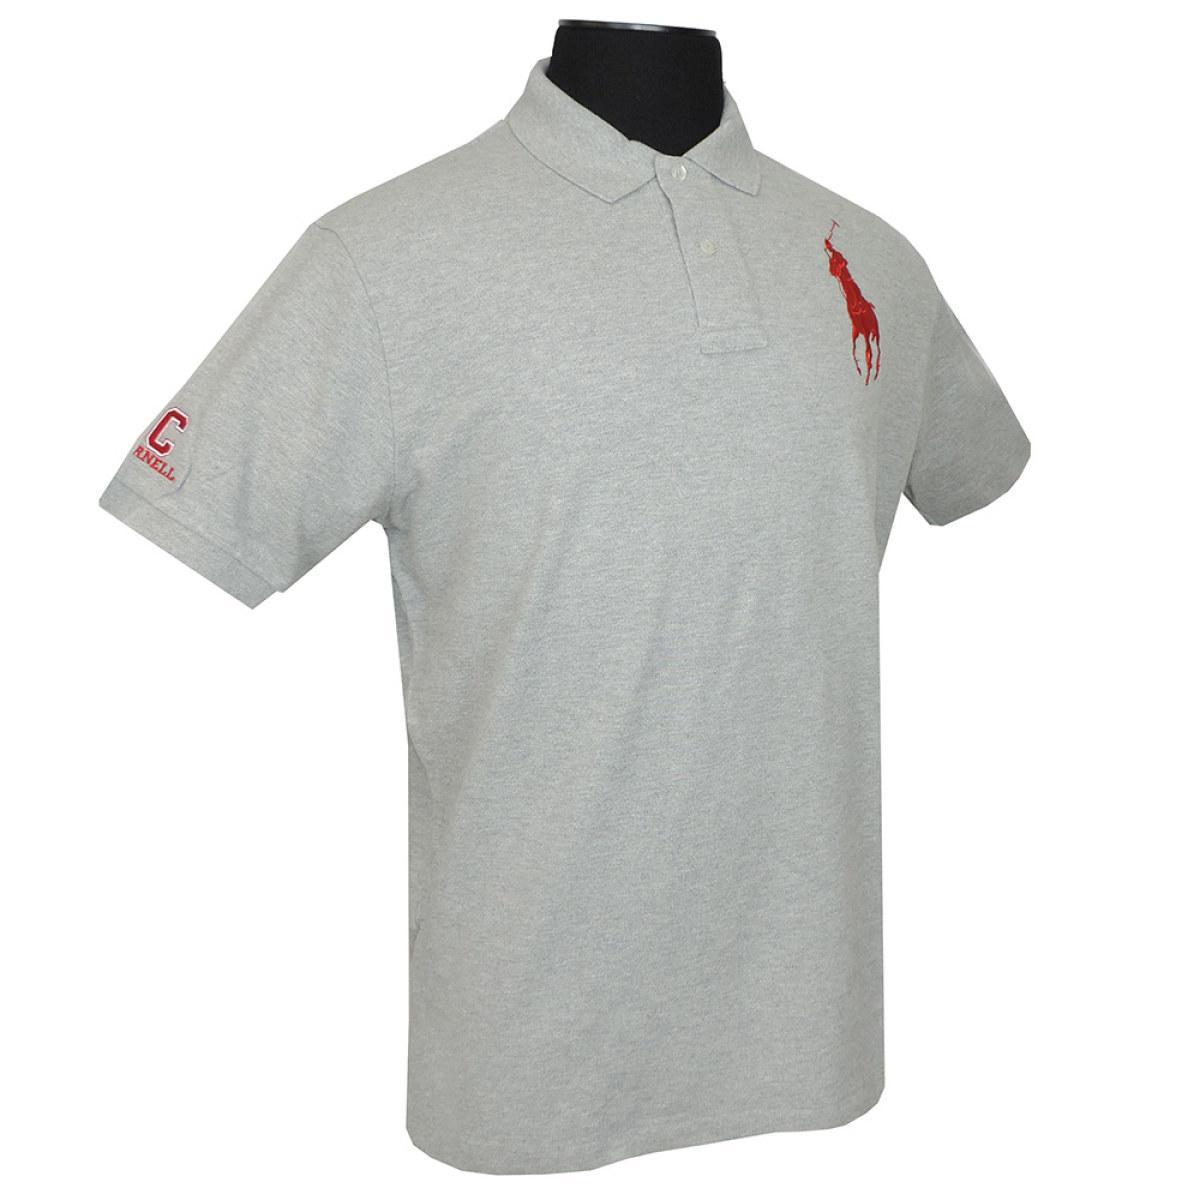 4c33b569b Ralph Lauren - Big Pony - Mesh Polo Shirt